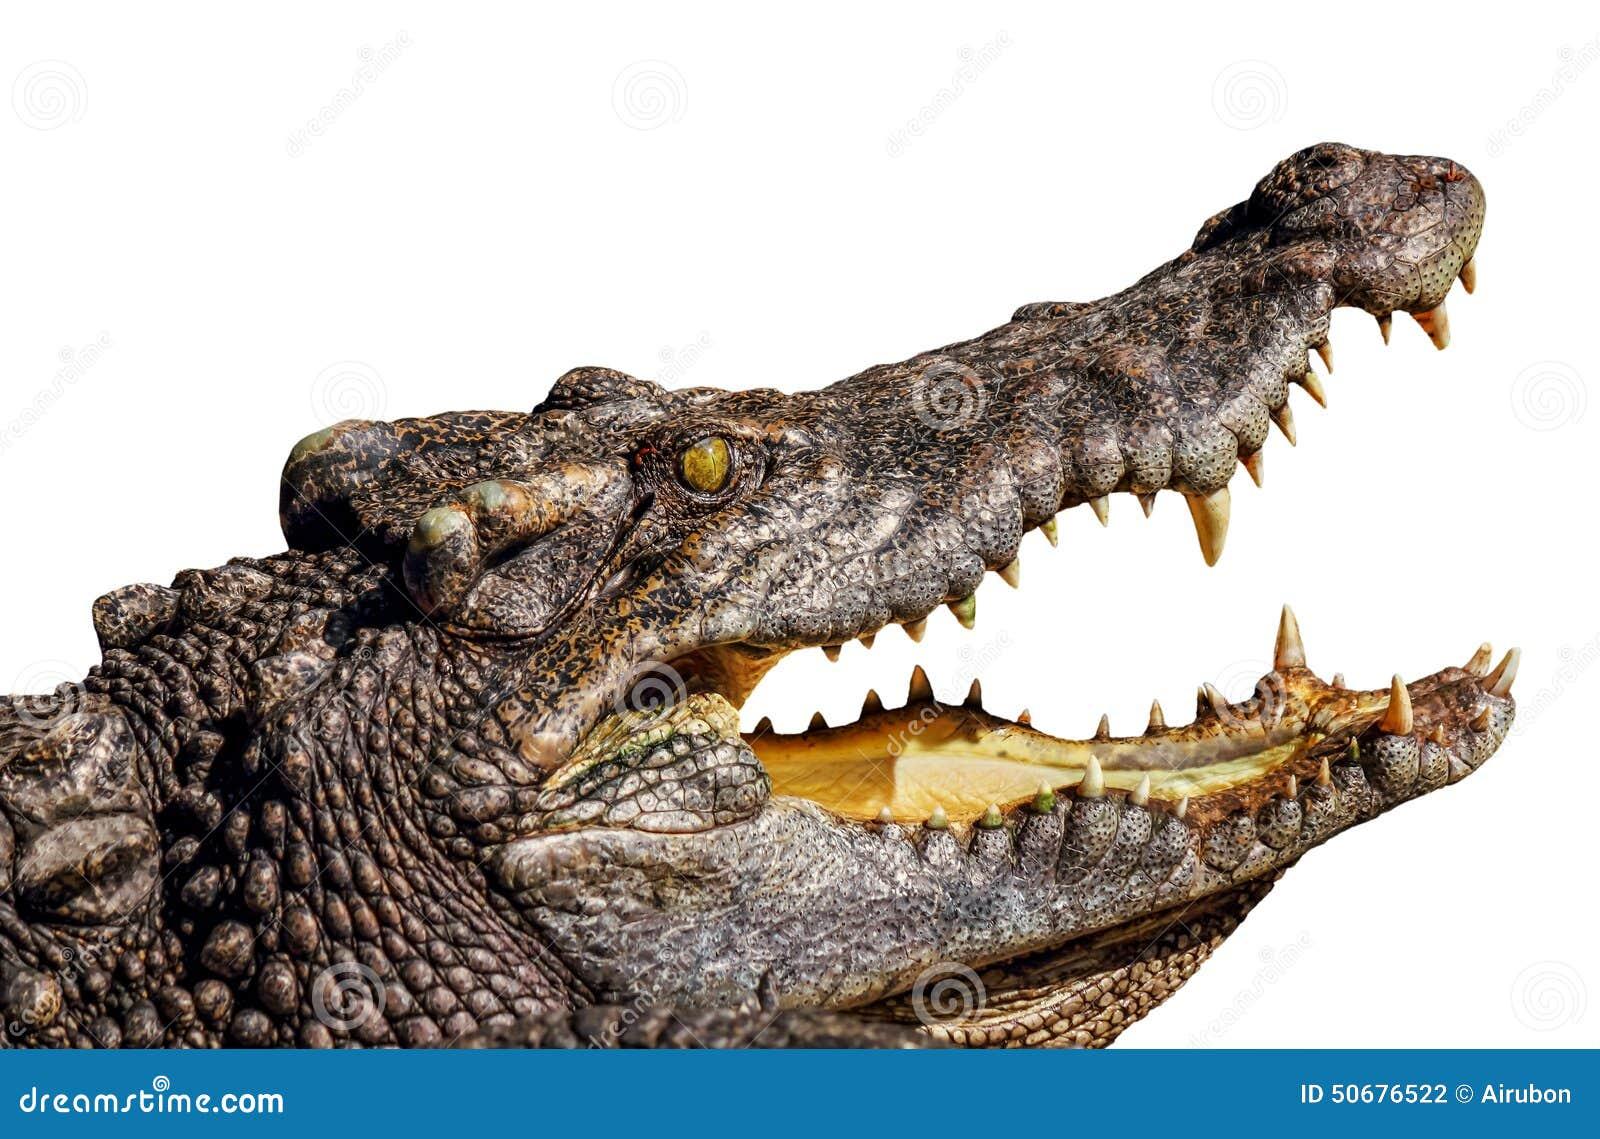 Download 开放鳄鱼的嘴 库存照片. 图片 包括有 下颌, 犬齿, 吓呆, 背包, 截肢术, 眼睛, browne, 纵向 - 50676522